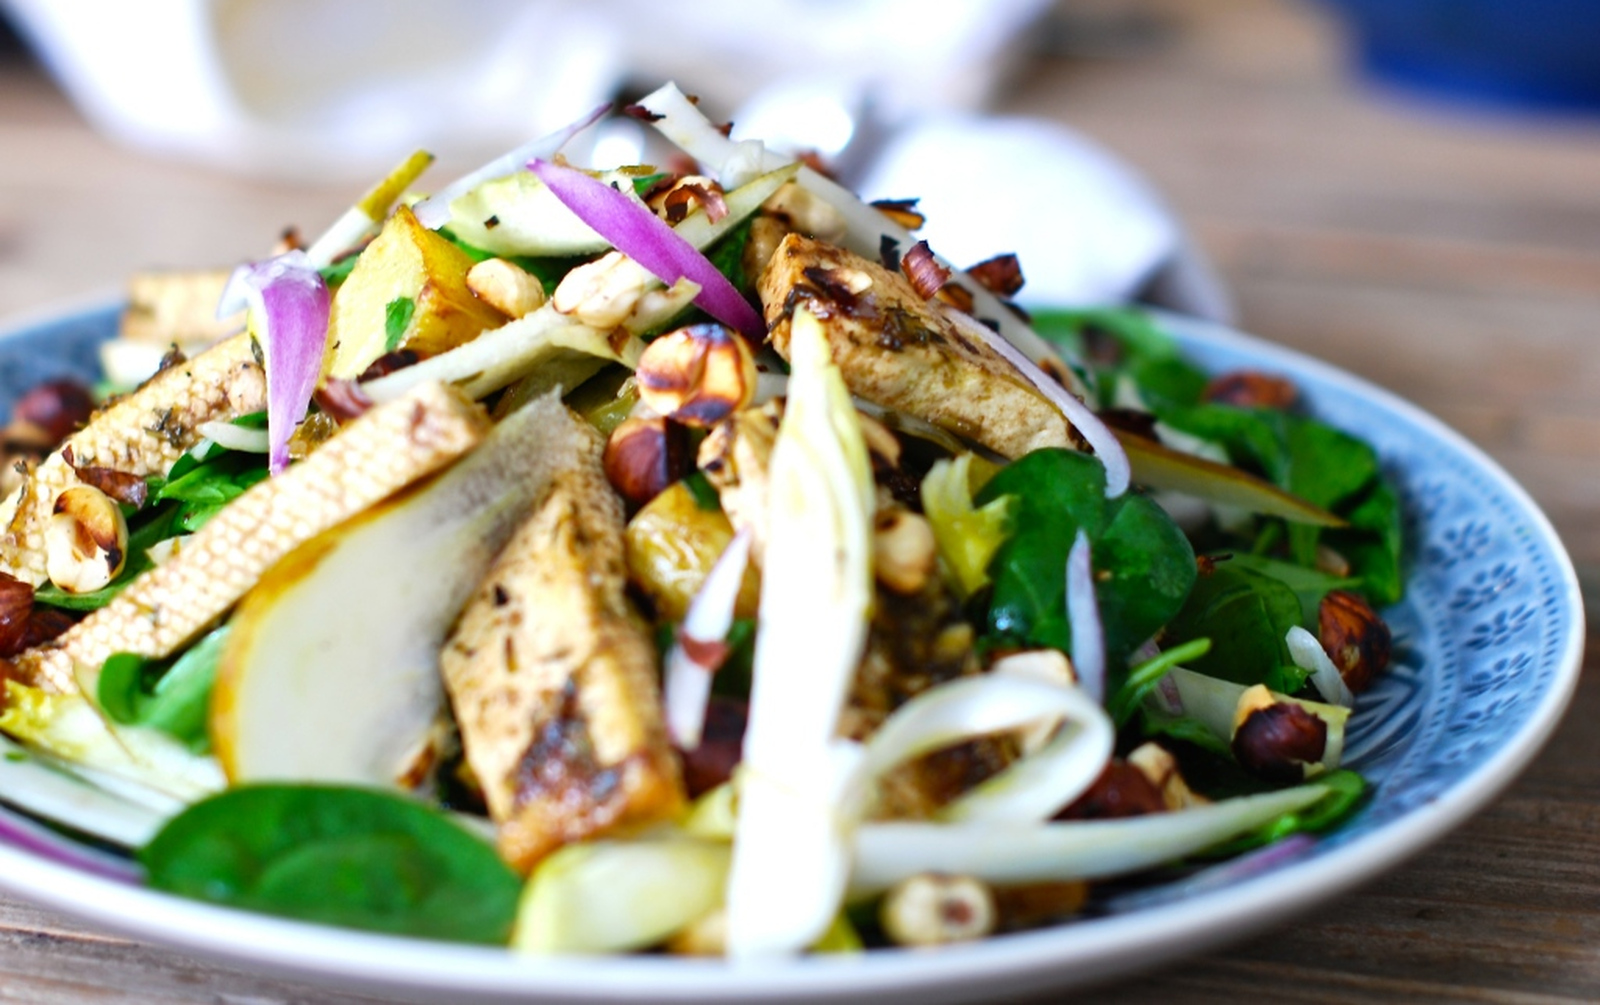 Warm Salad With Marinated Tofu, Potatoes, and Hazelnuts [Vegan, Gluten-Free]